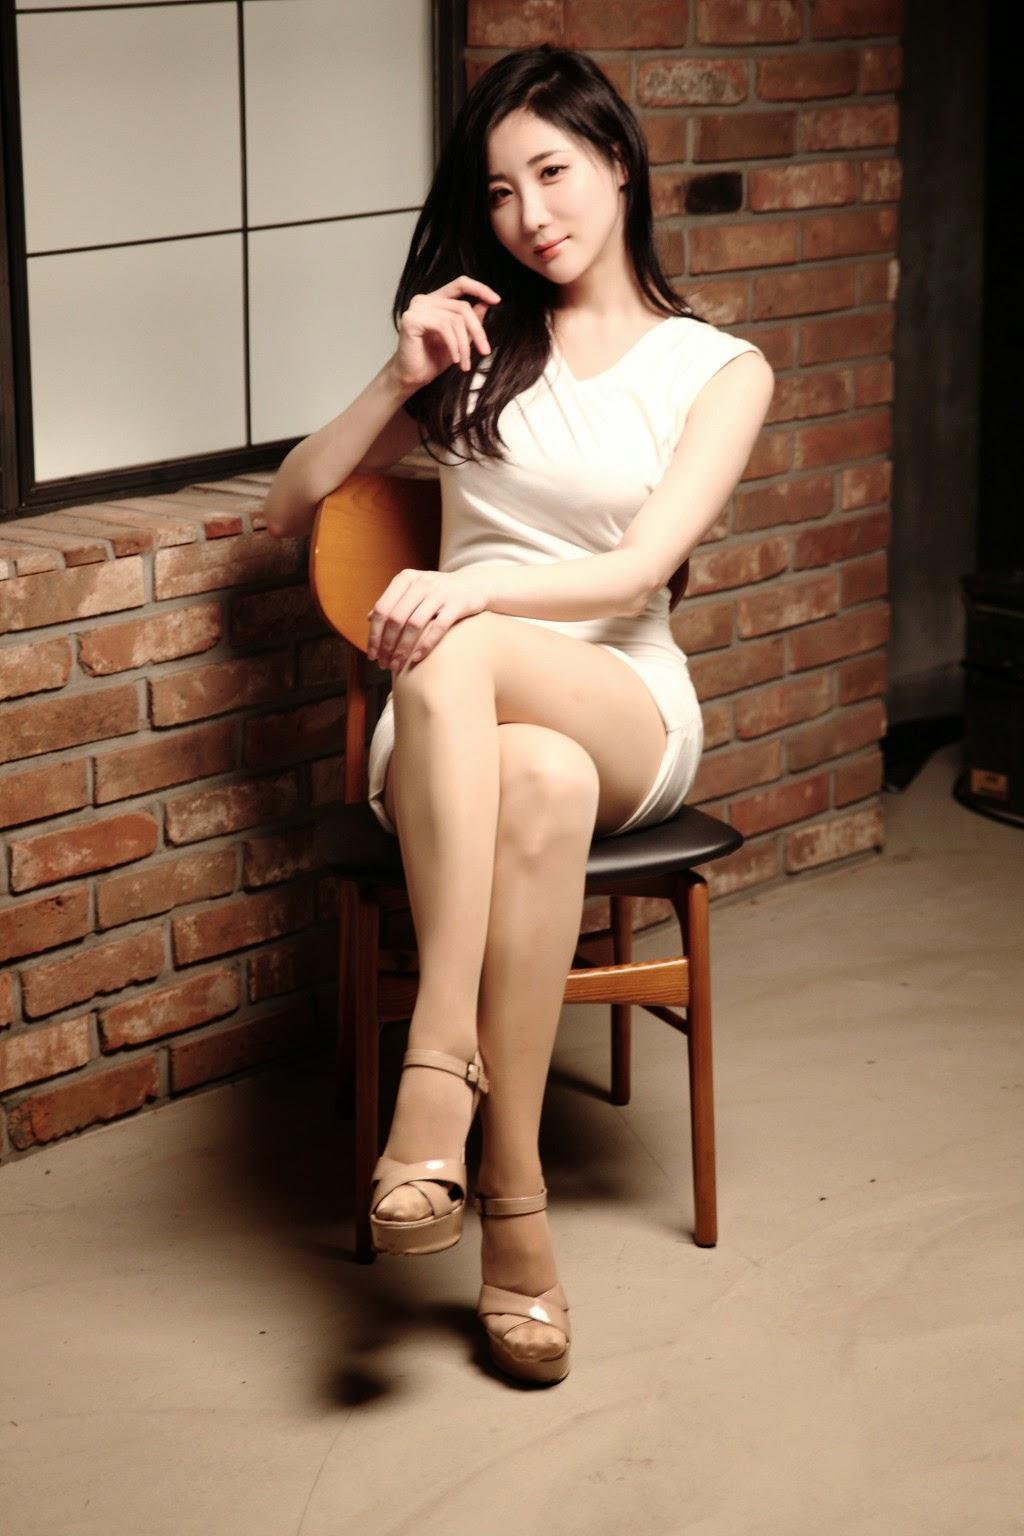 3 Yeon Da Bin- Three new studio sets - very cute asian girl - girlcute4u.blogspot.com